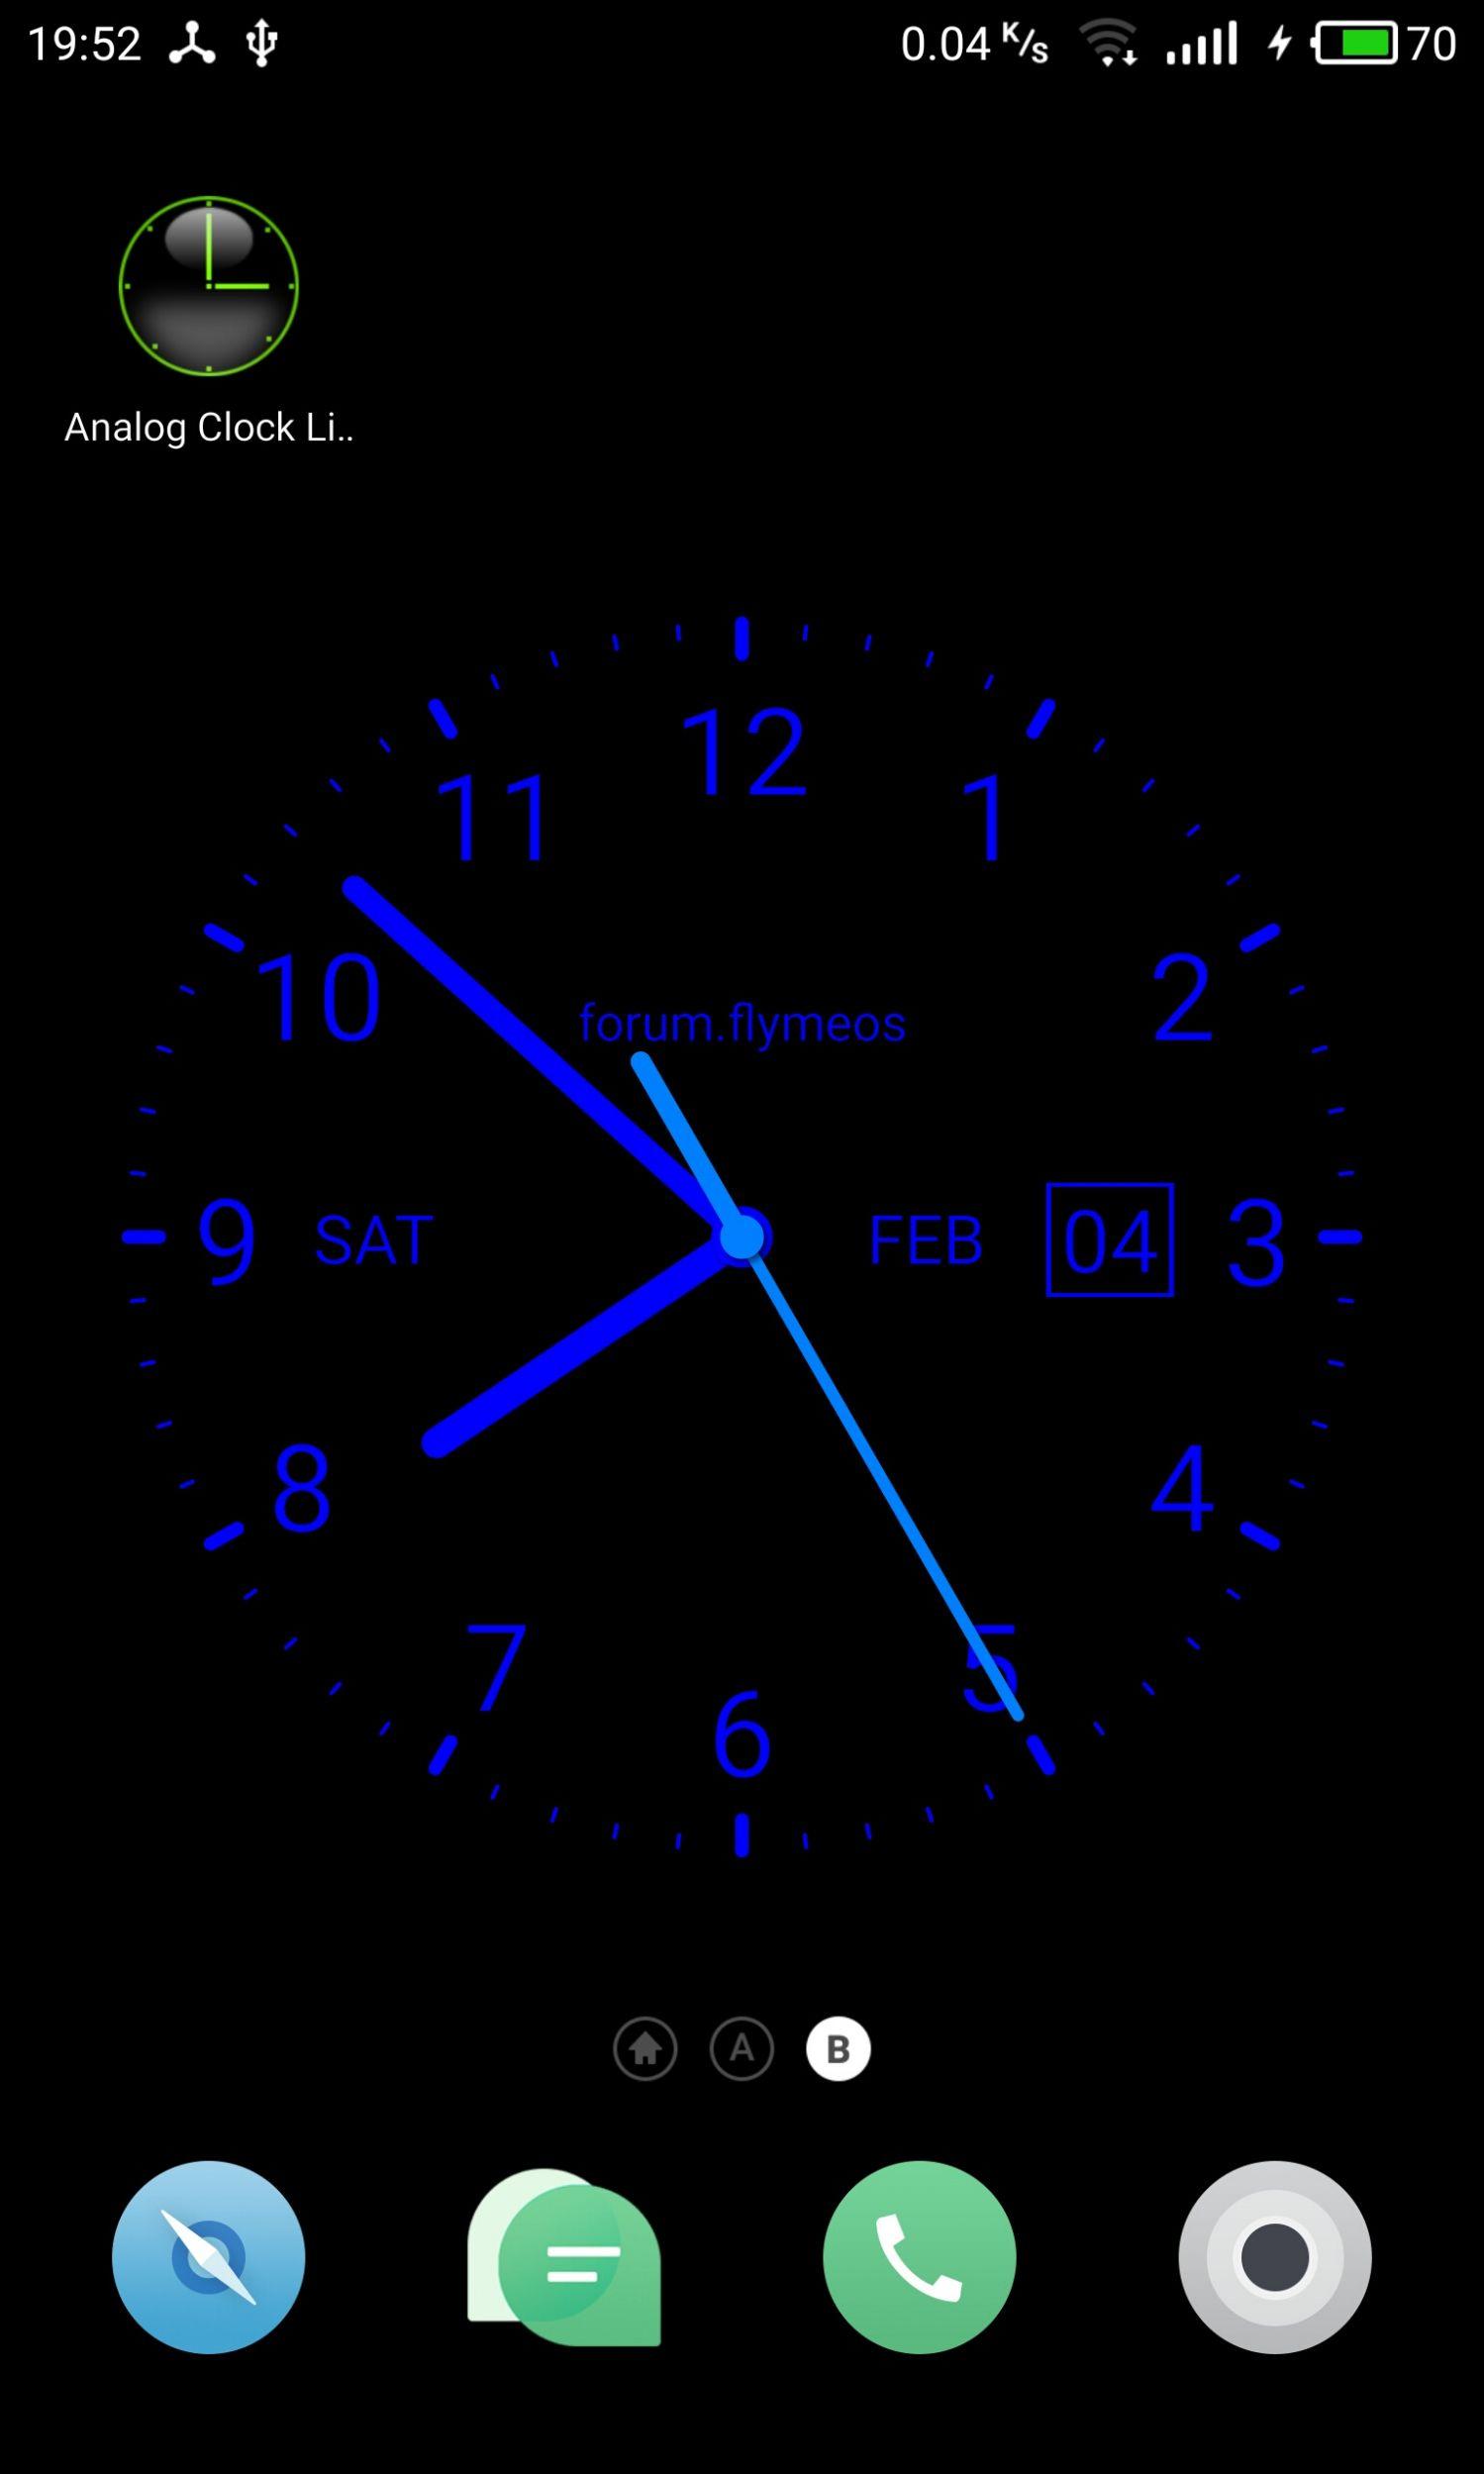 Analog Clock Live Wallpaper Wall Clock 67217 Hd Wallpaper